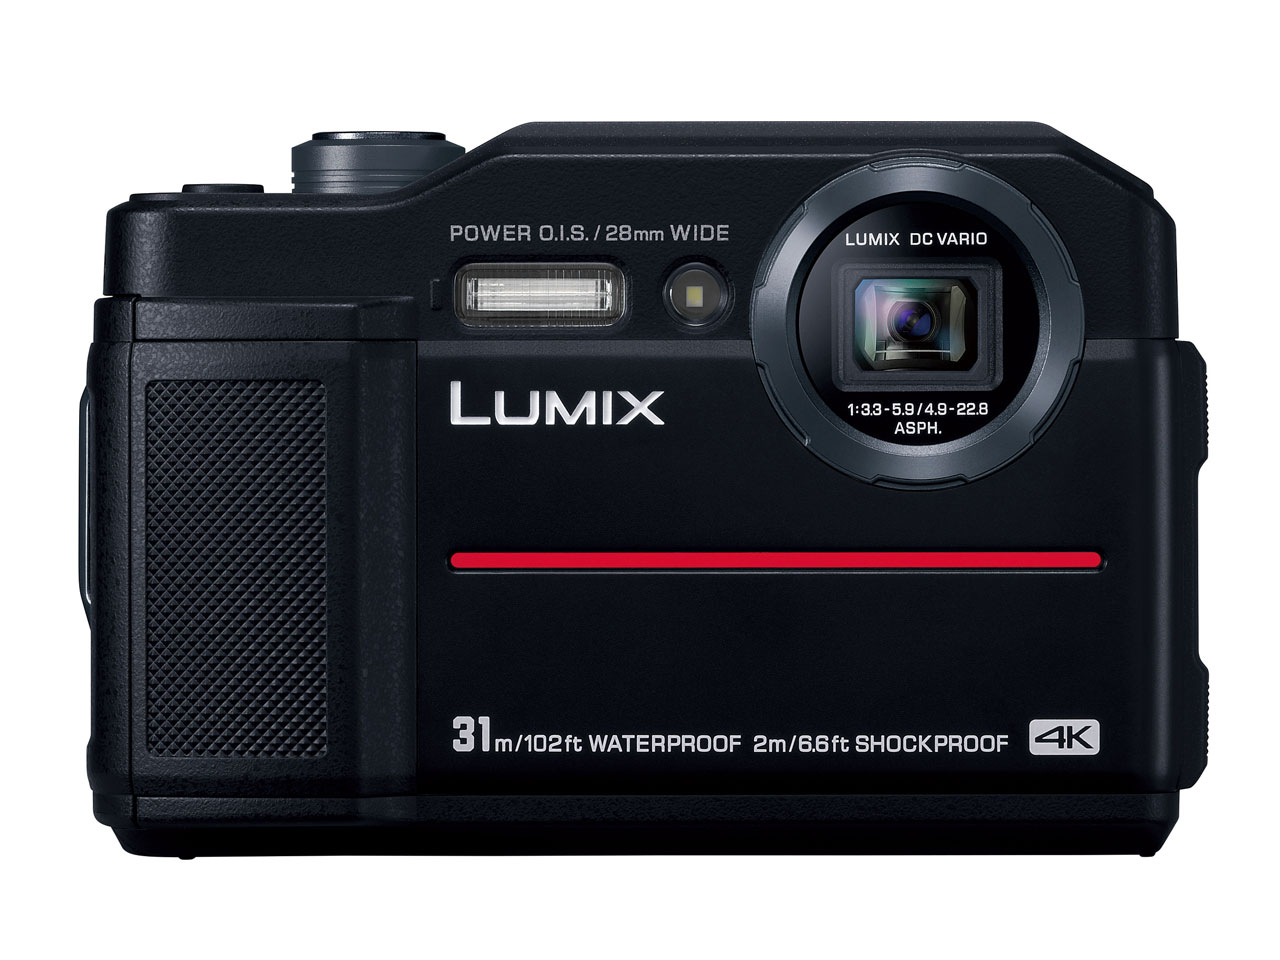 LUMIX DC-FT7-K [ブラック] の製品画像